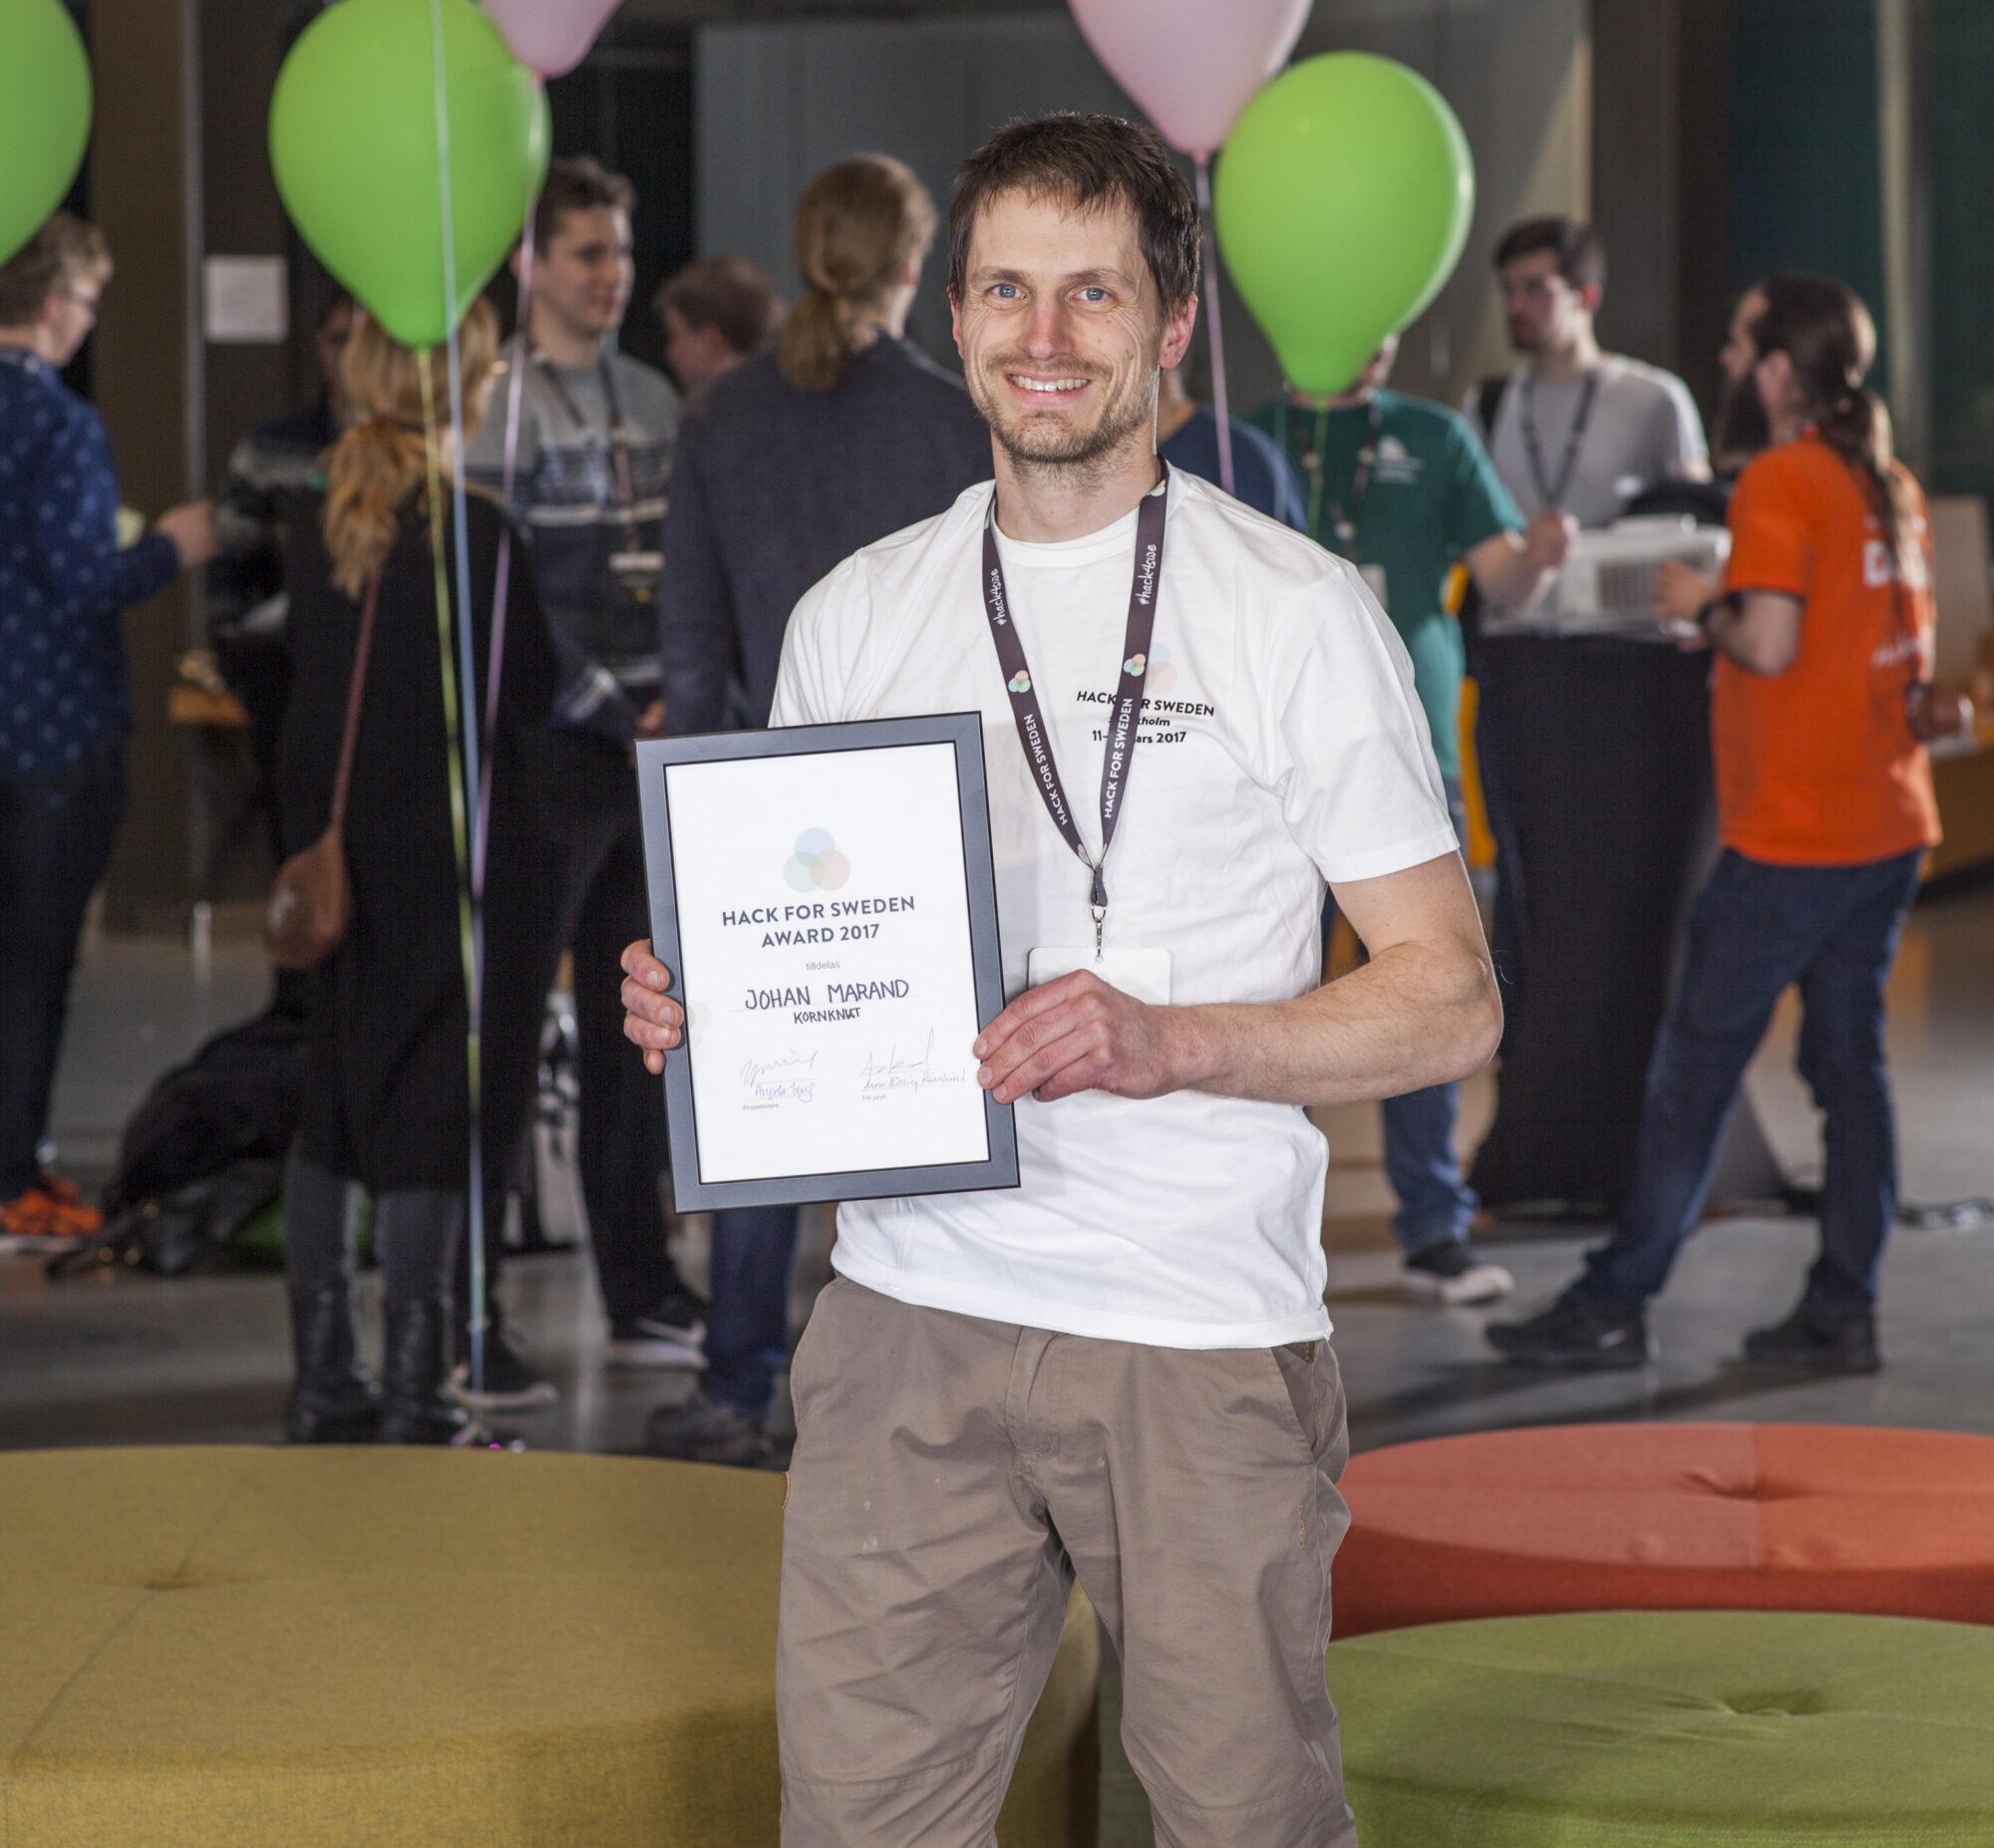 Skogsprojekt vann Hack for Sweden Award 2017